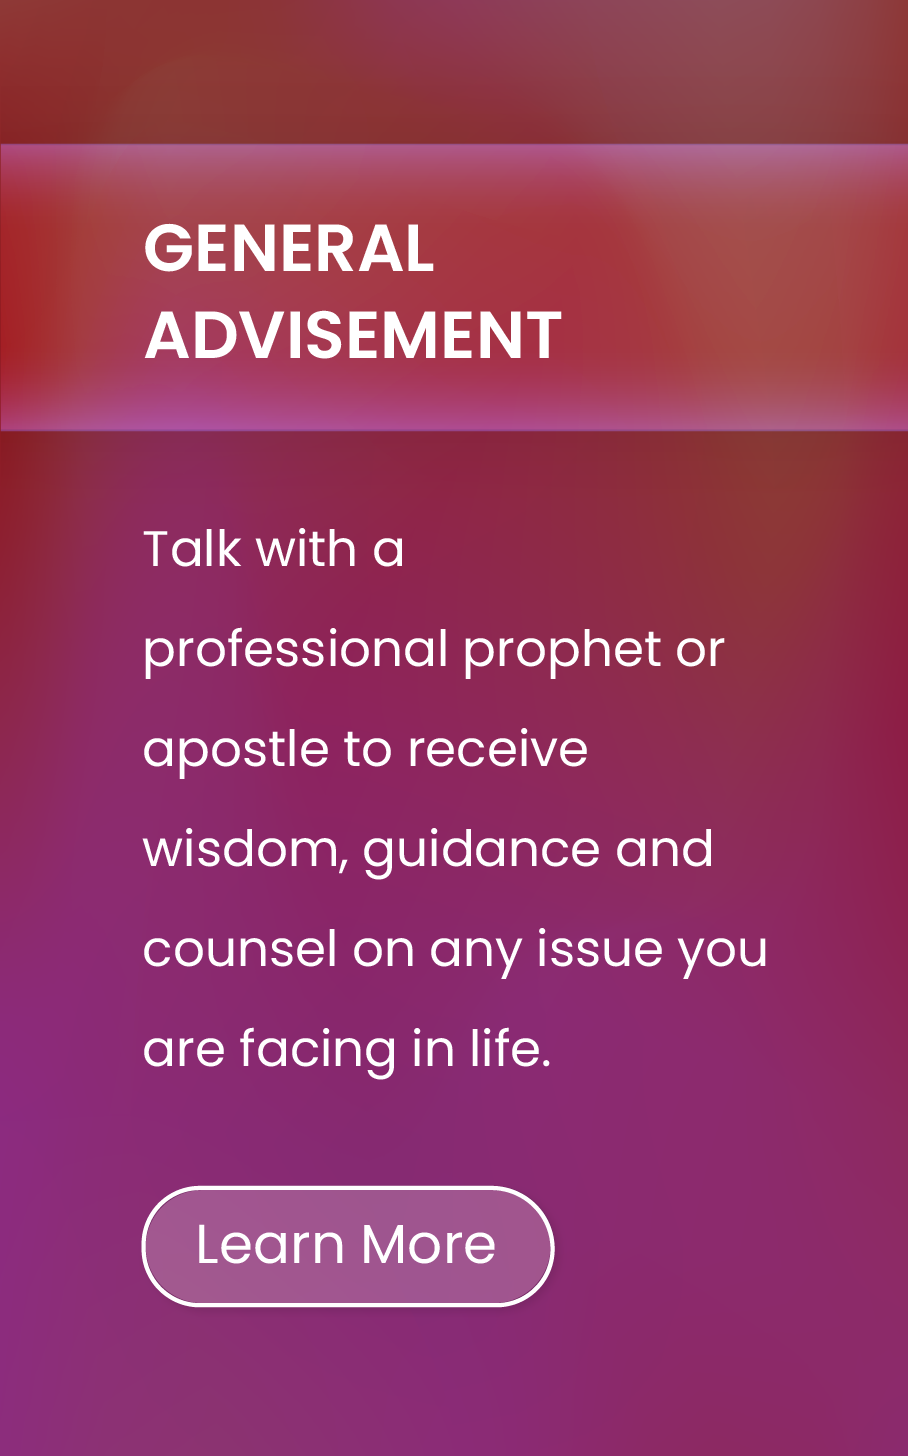 General Advisement